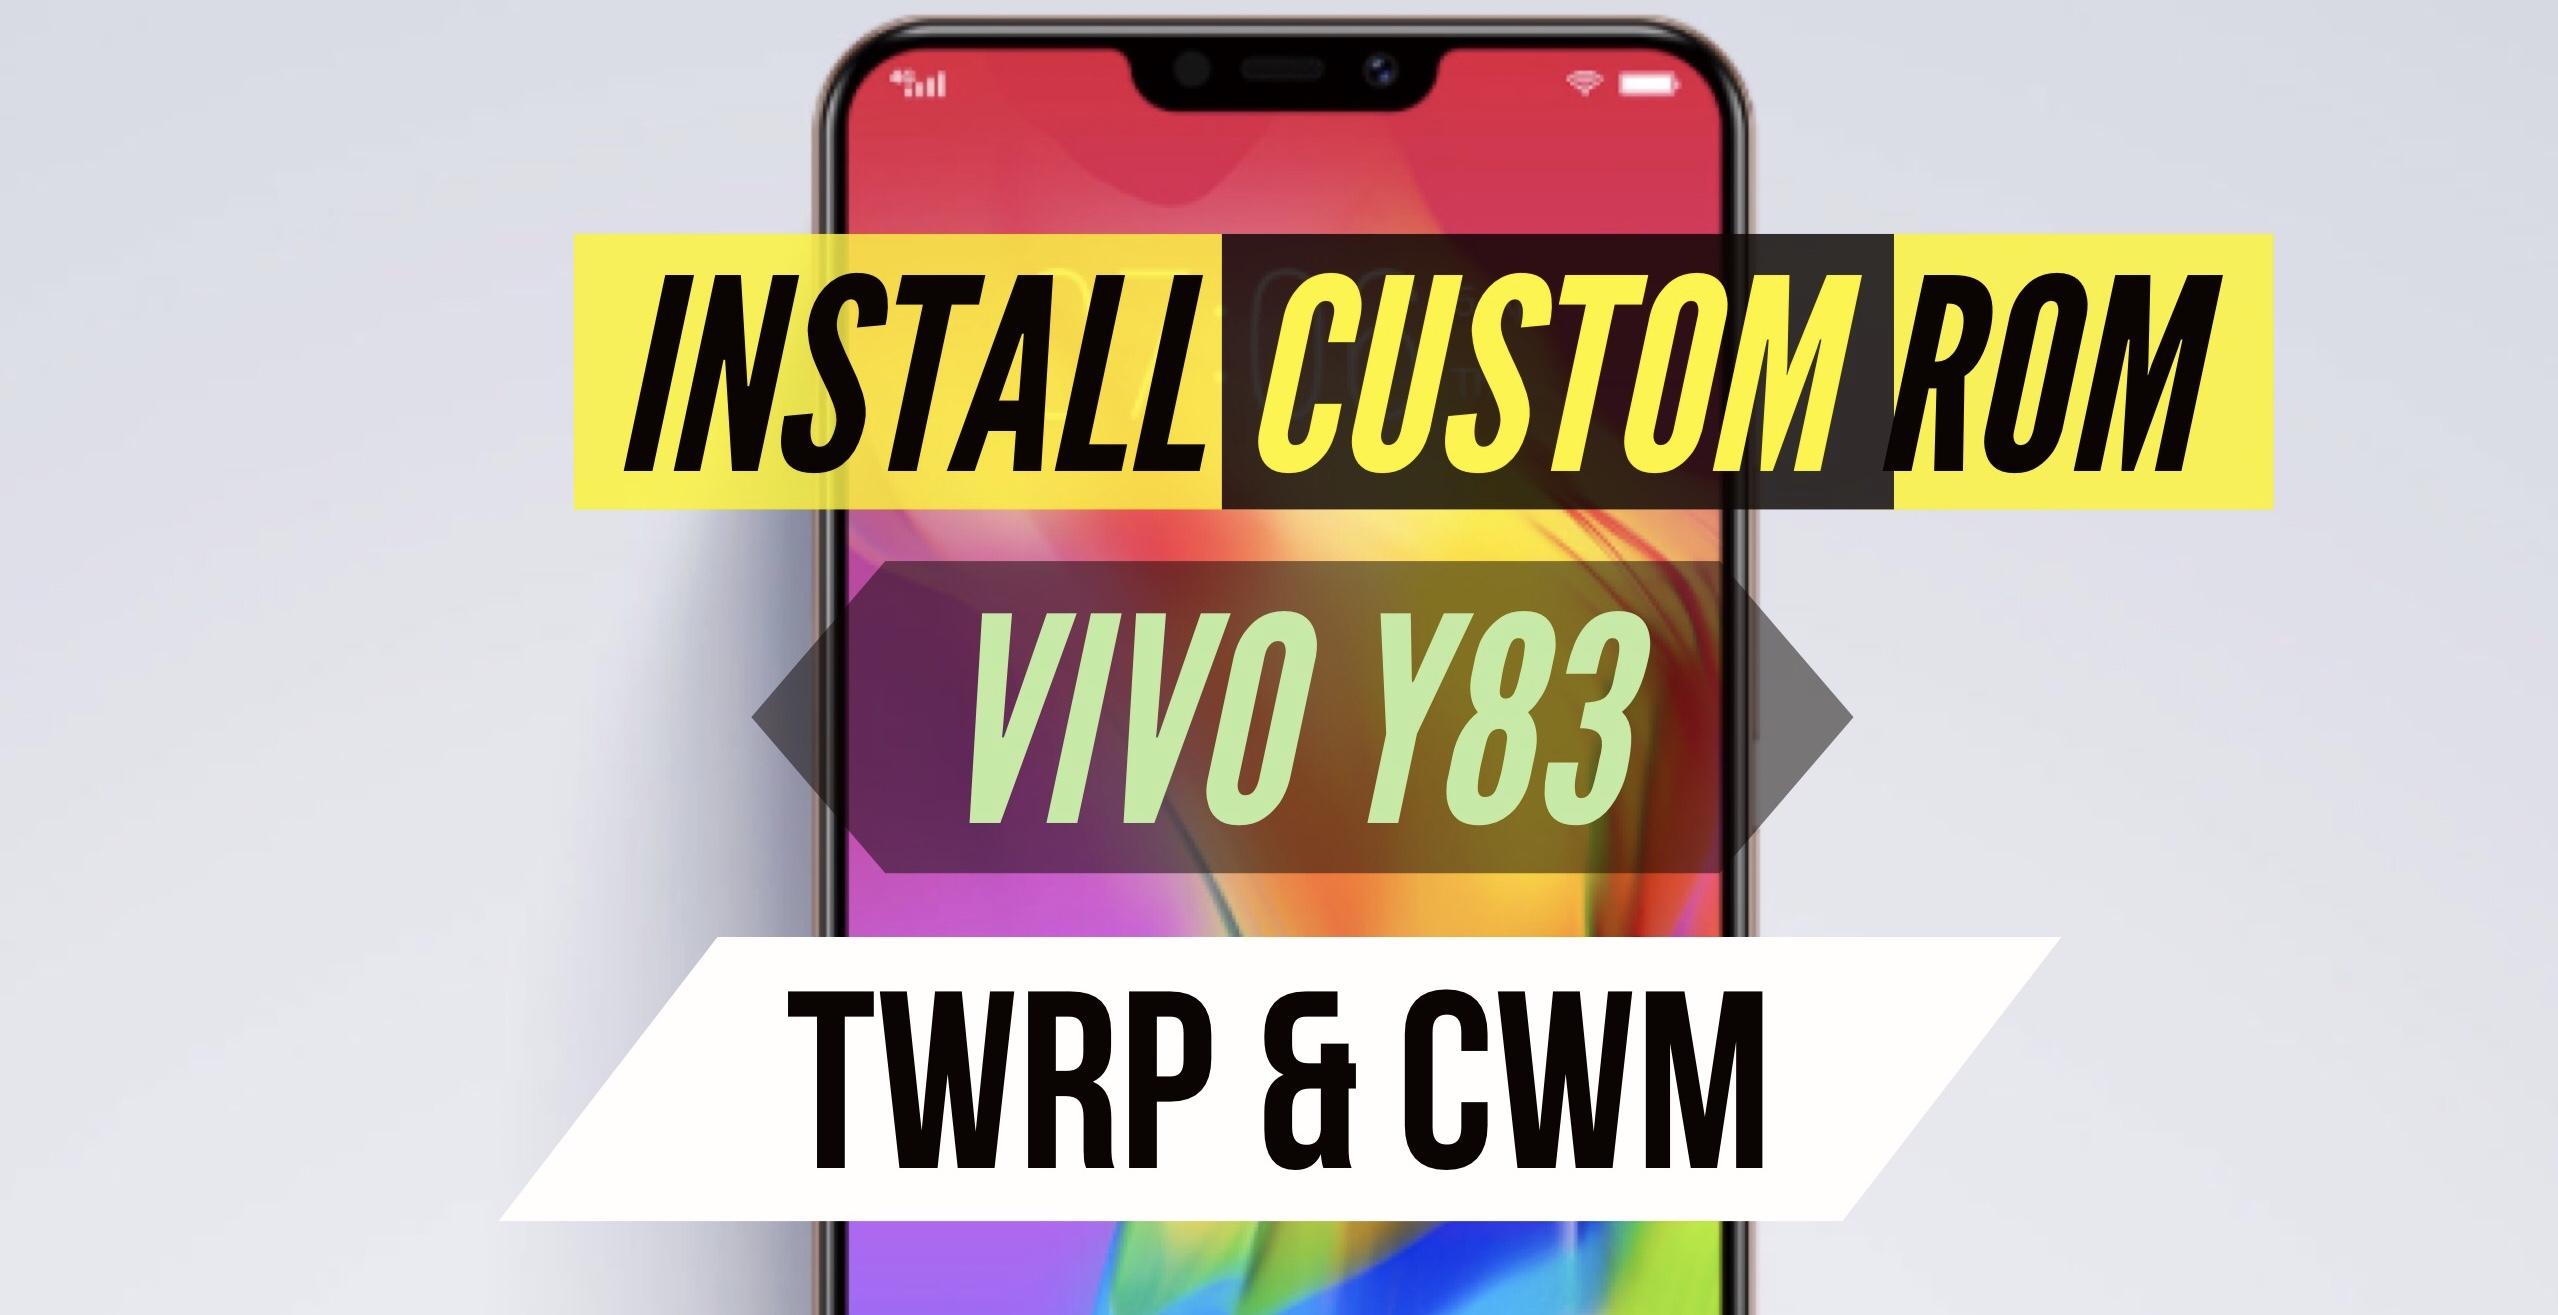 VIVO Y83 Custom ROM Installation - Two Easy METHODS!